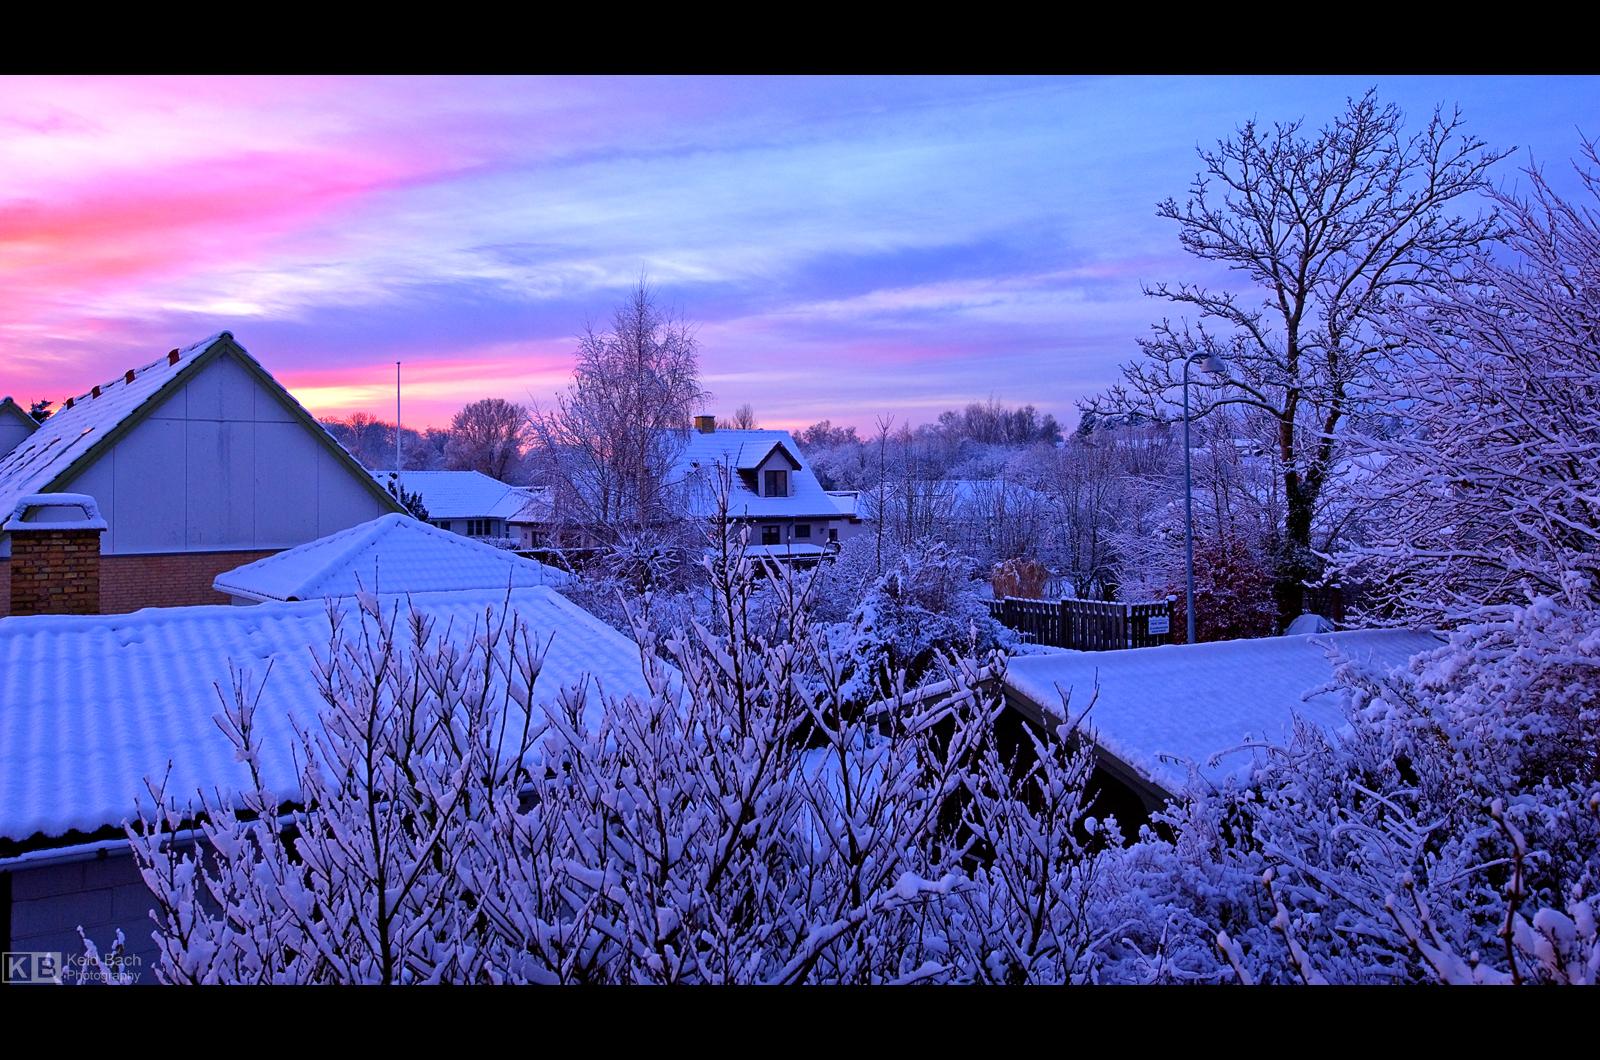 December Mood by KeldBach